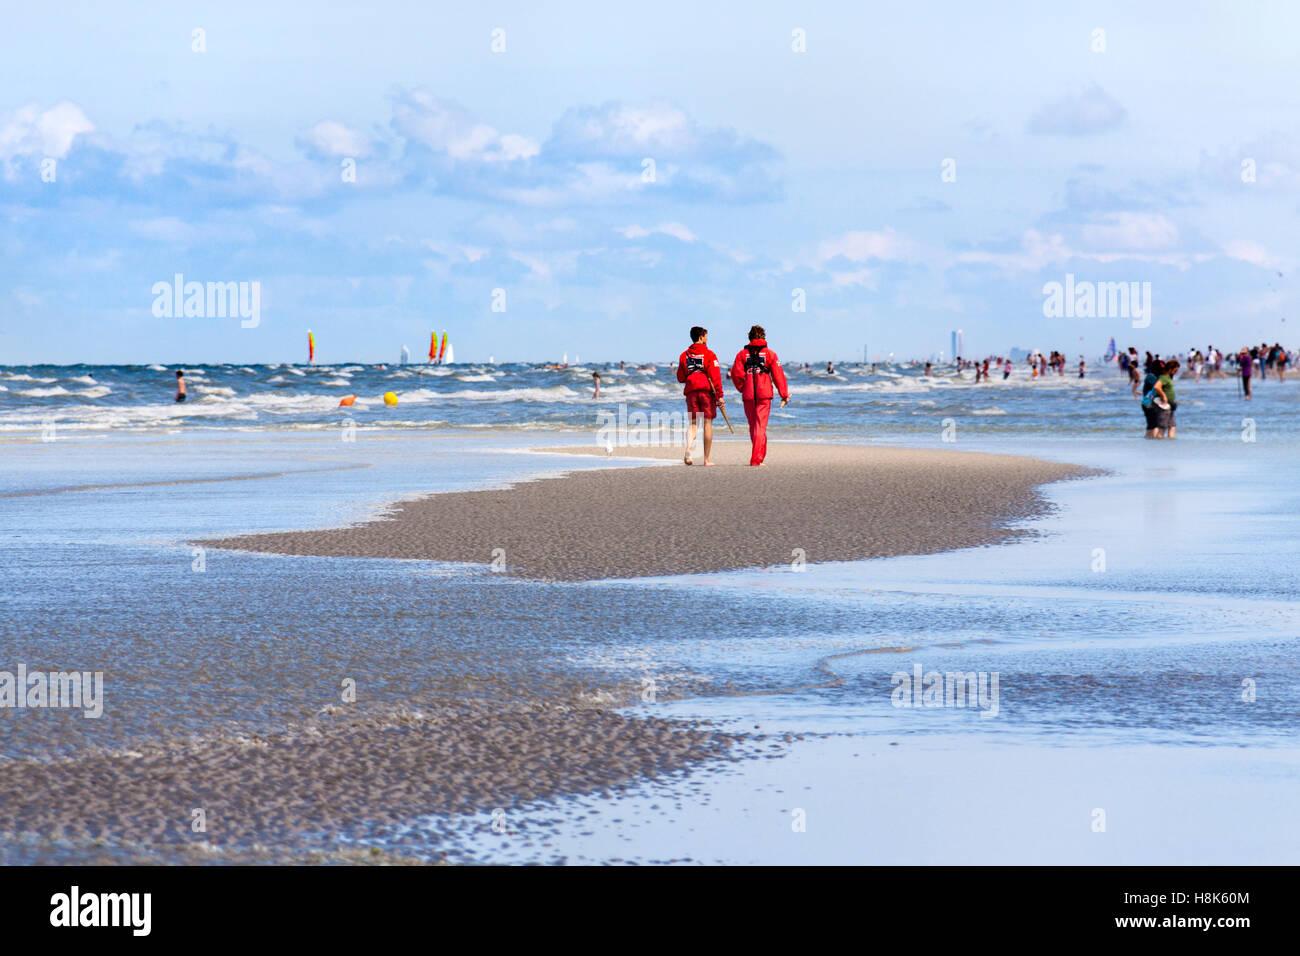 Two lifeguards patrolling the beach in the seaside resort of Middelkerke, Belgium Stock Photo